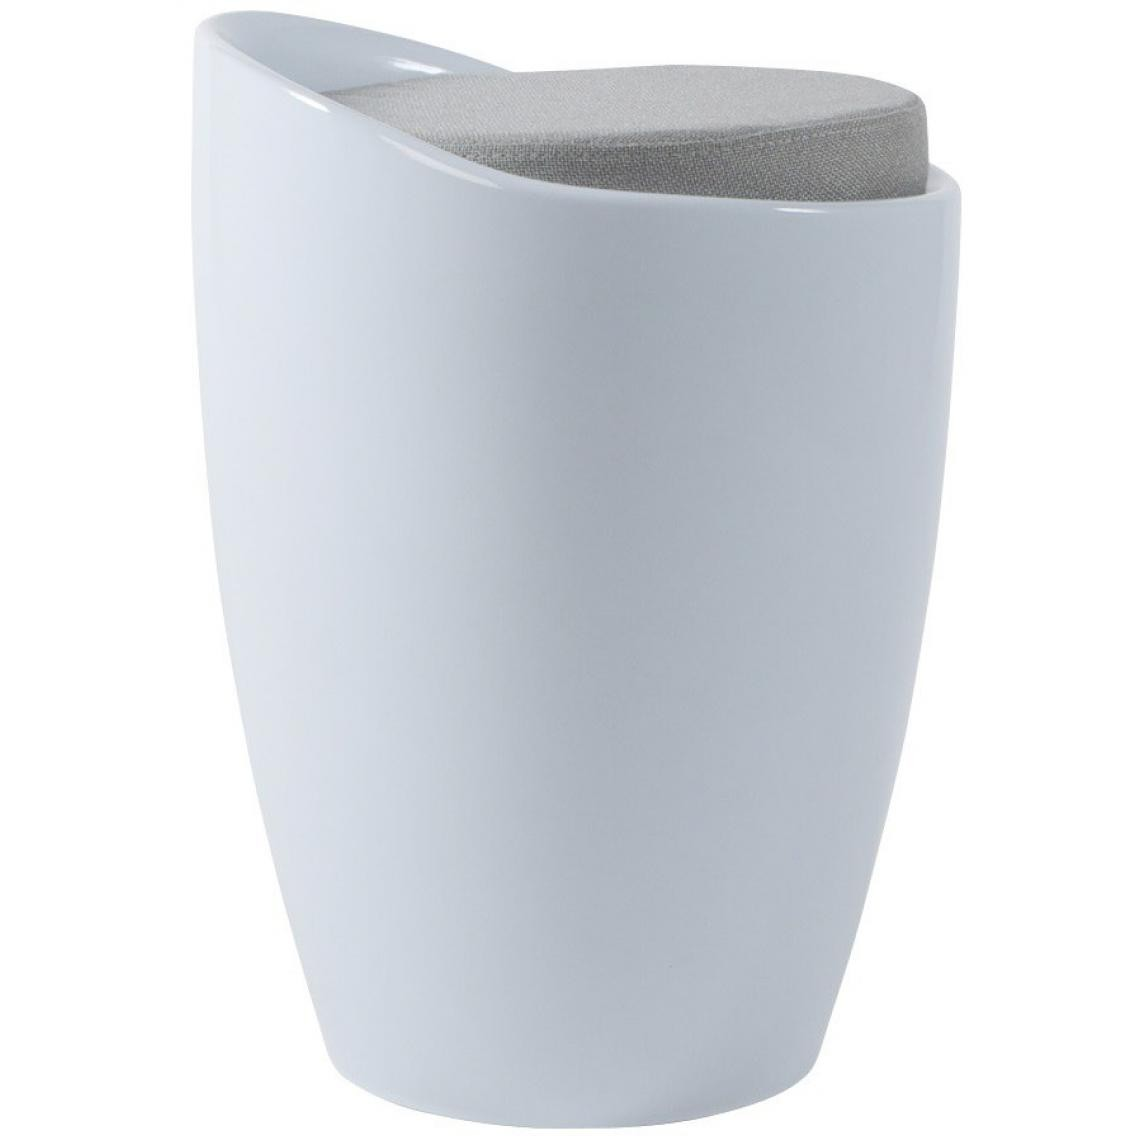 Tabouret bas blanc en tissu SANTEX JQEc0